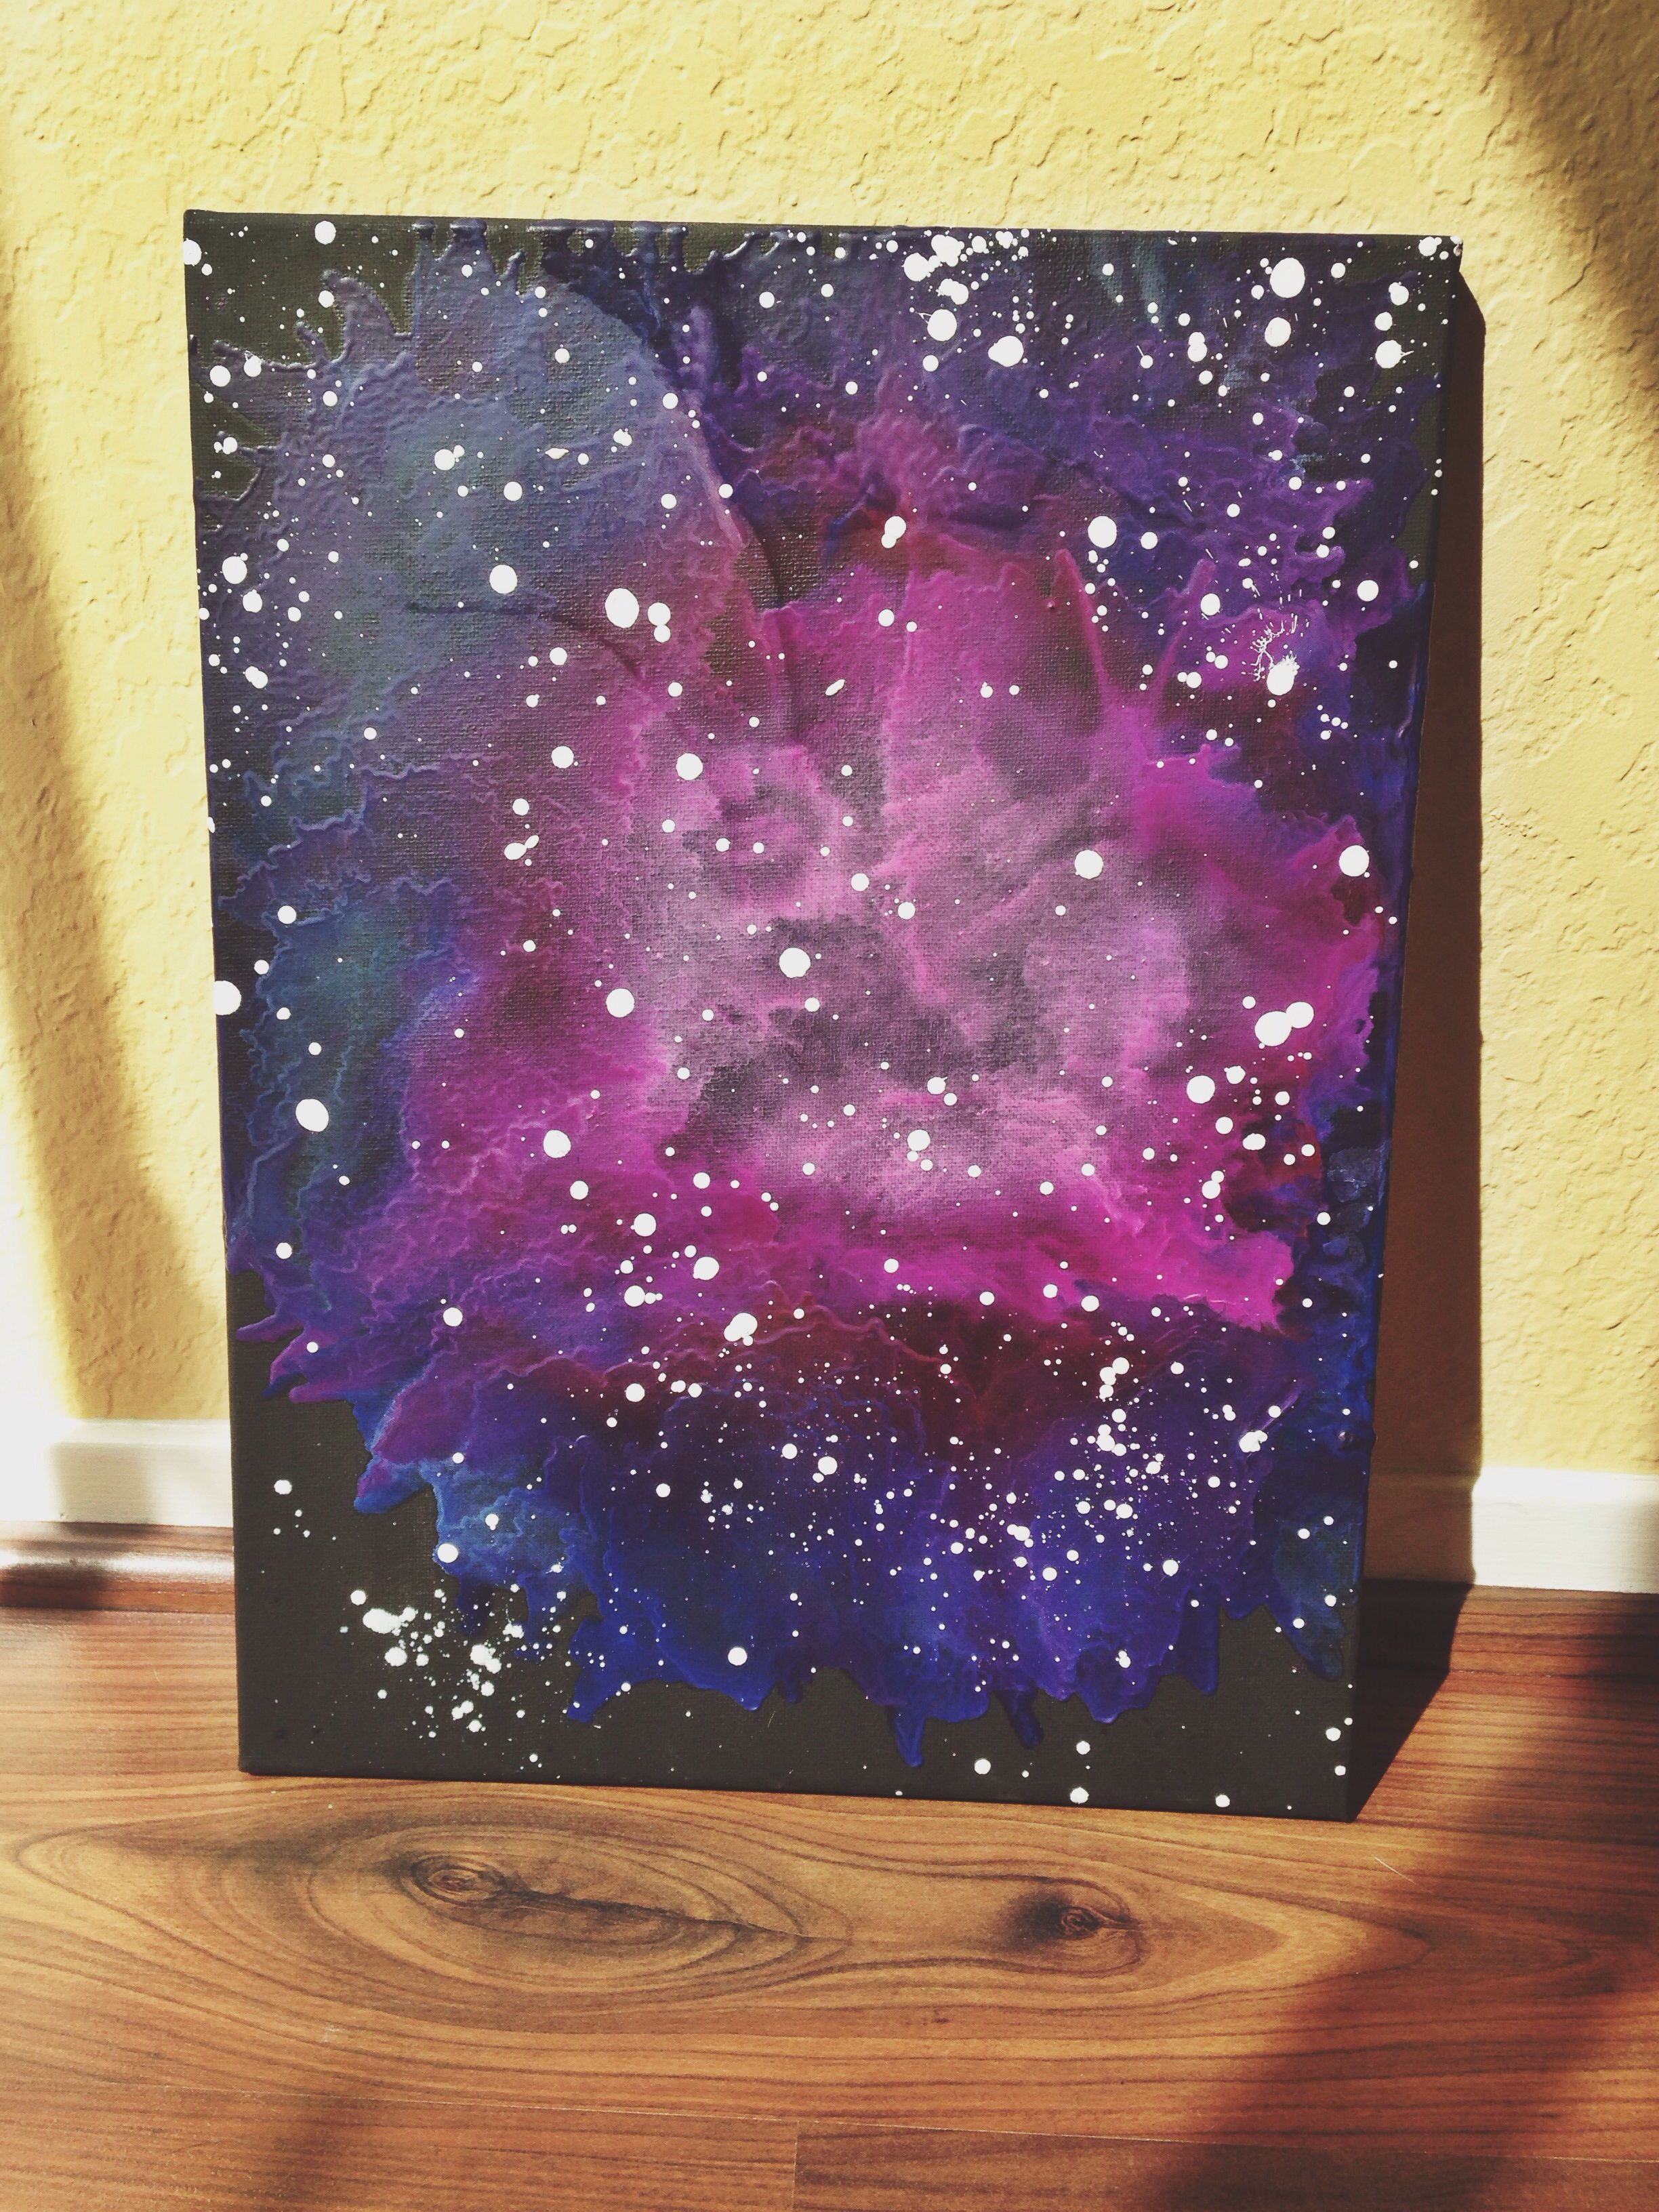 Nebula melted crayon art   Crayon Gogh   Pinterest ...